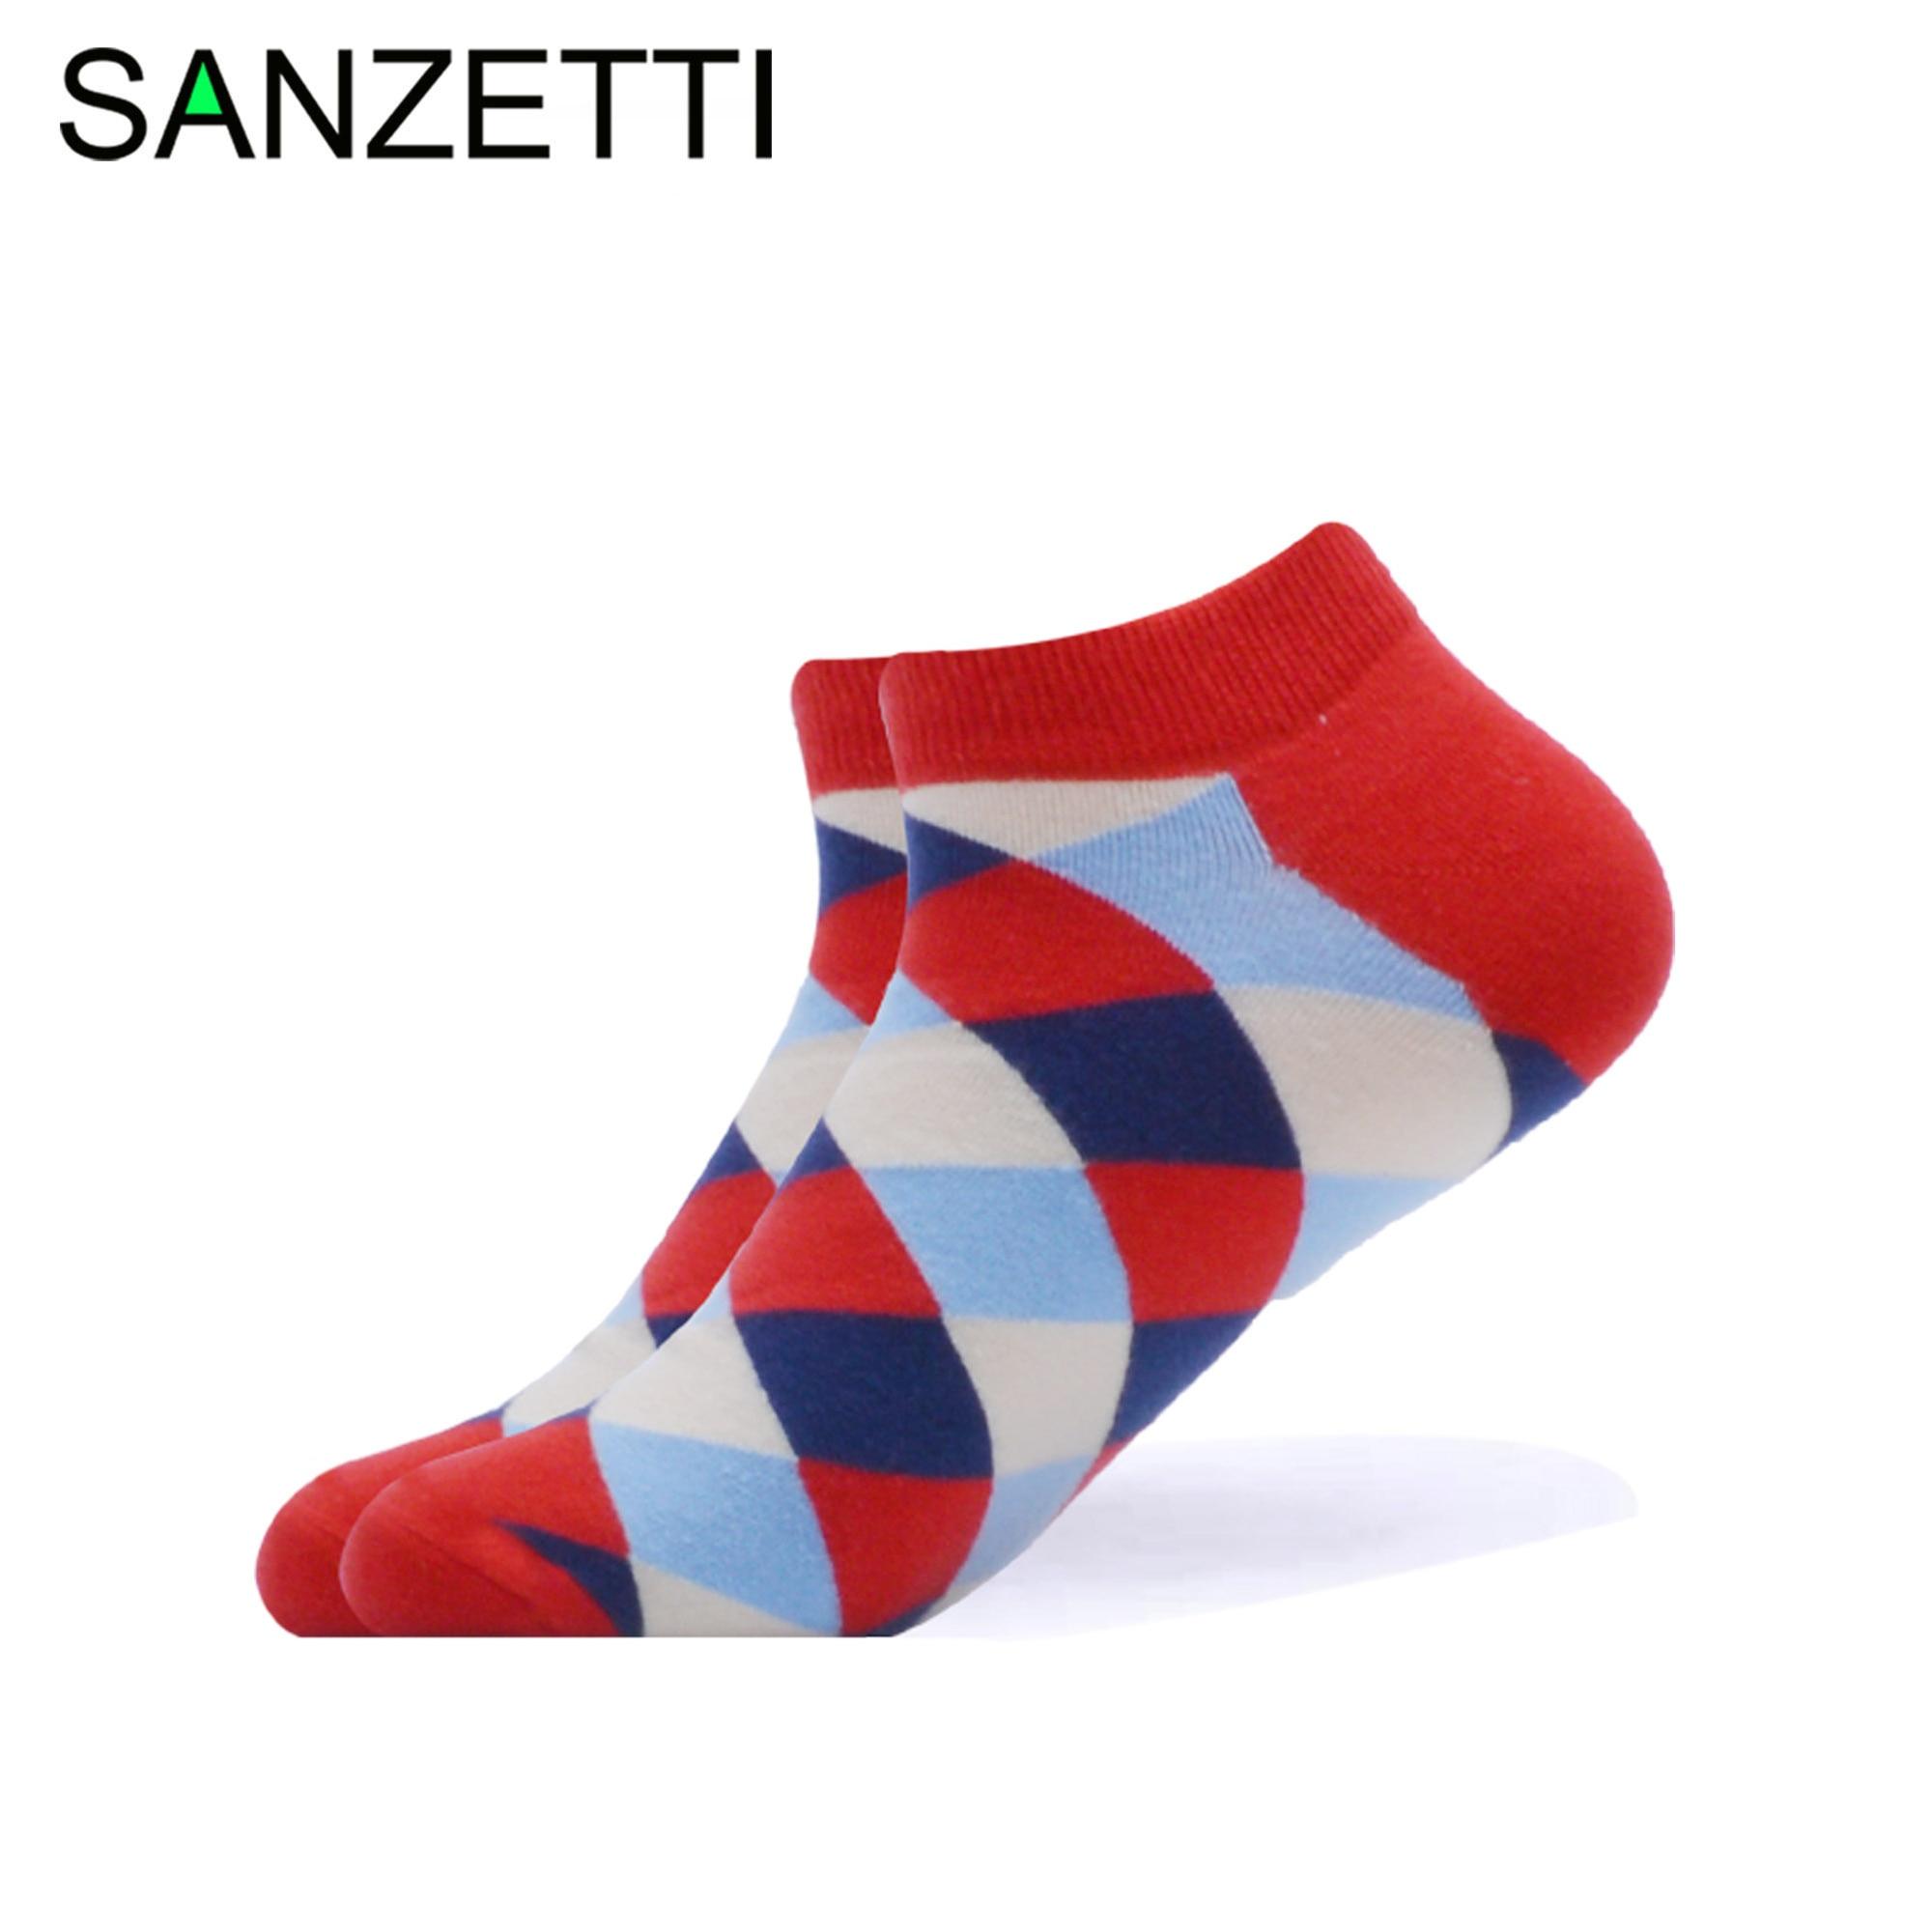 SANZETTI 1 Pair 2020 New Men's Summer Casual Ankle Socks Colorful Combed Cotton Socks Burger Pattern Dress Wedding Boat Socks